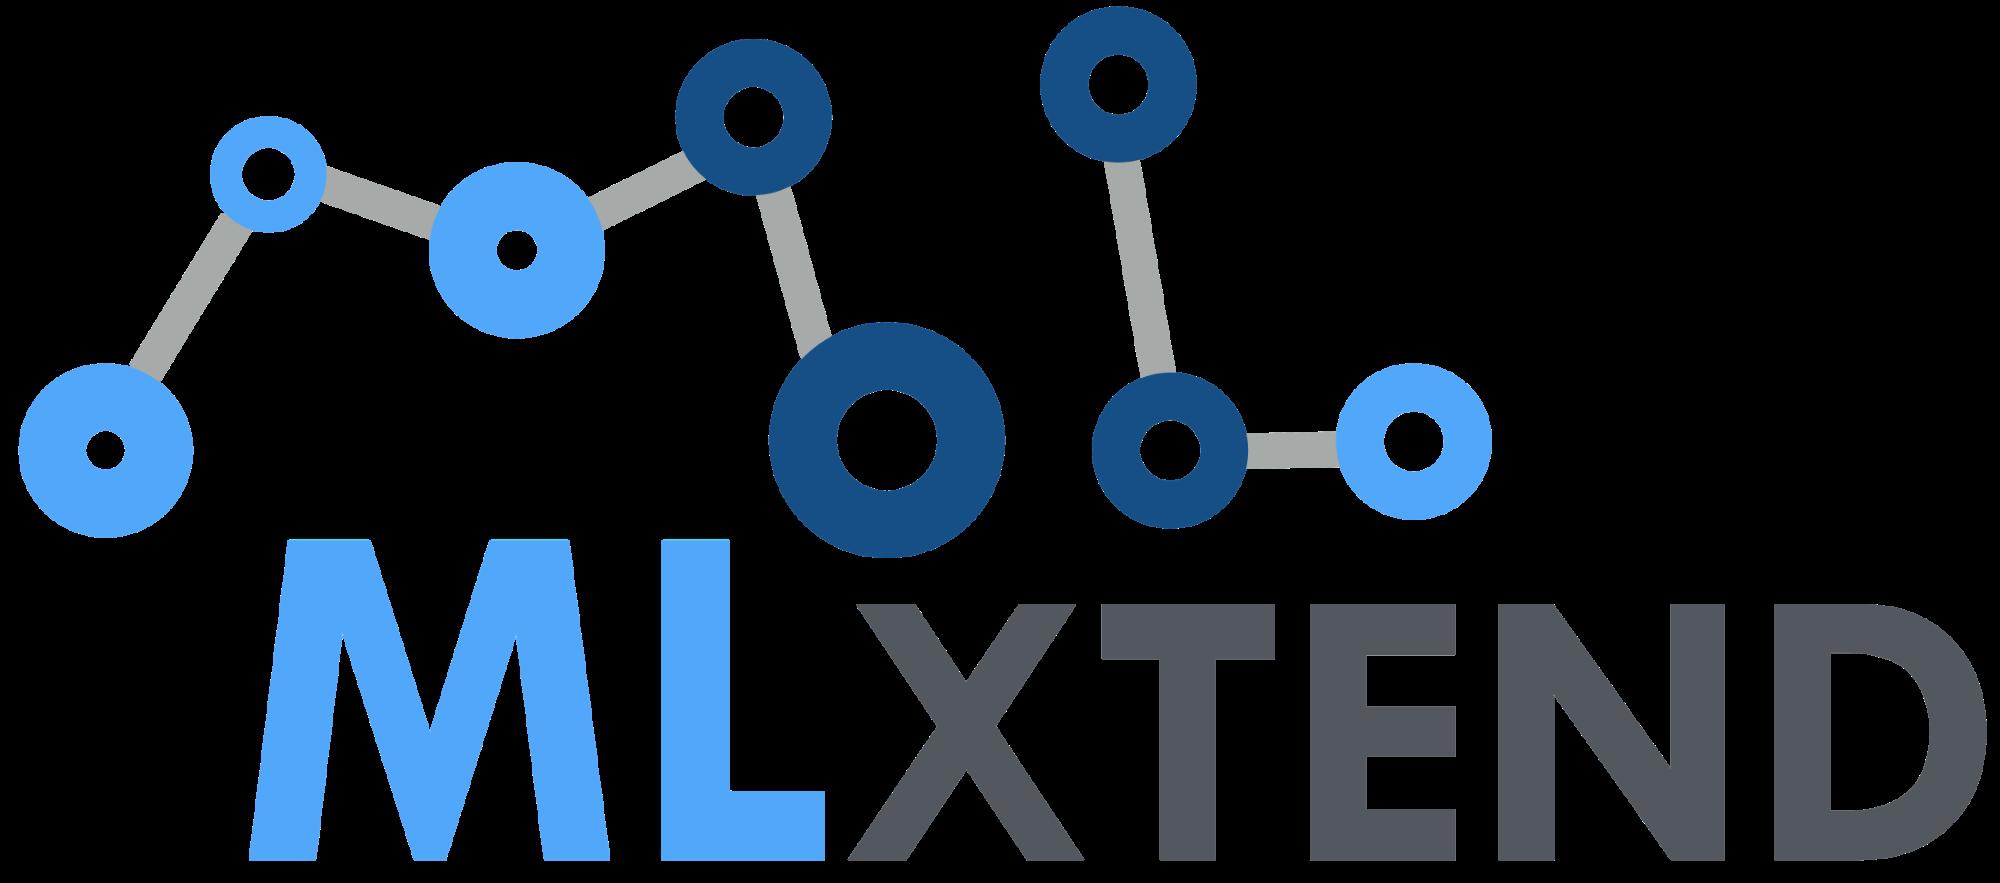 mlxtend-logo